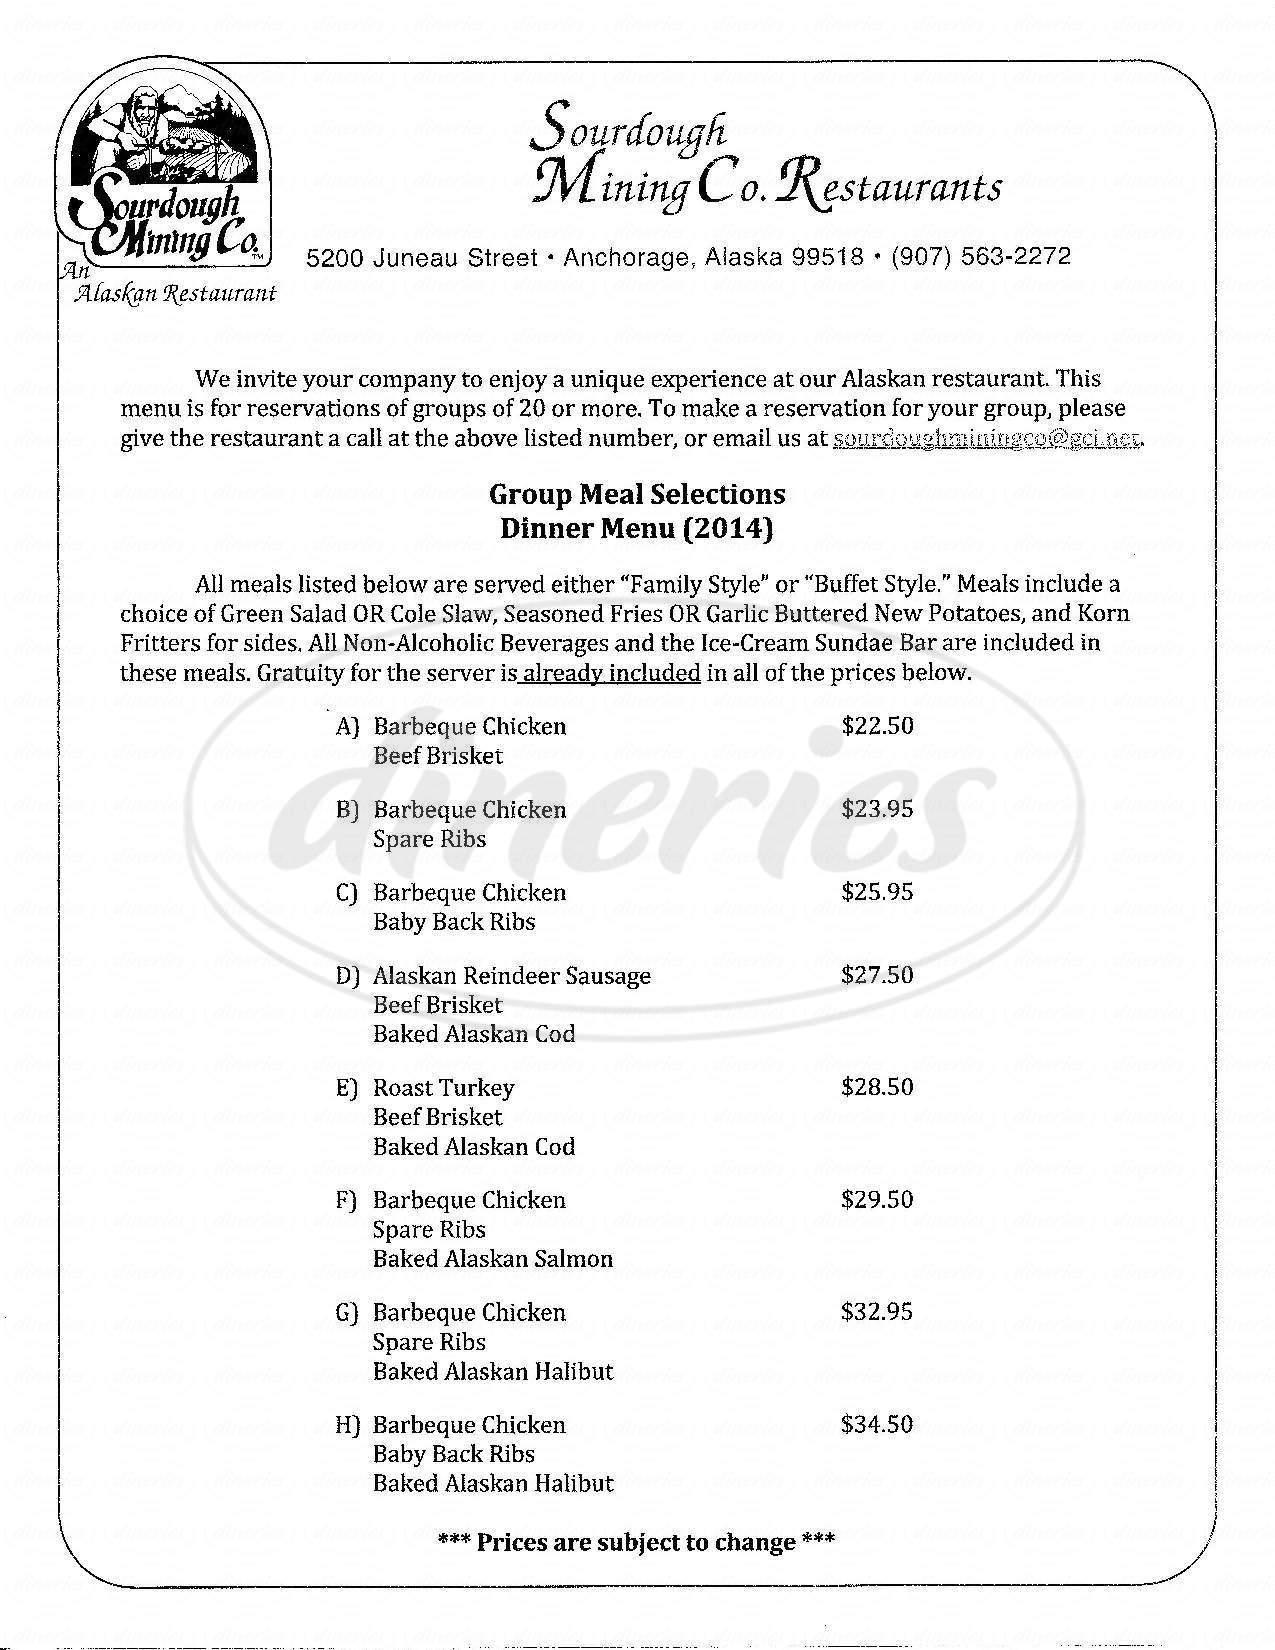 menu for Sourdough Mining Co.